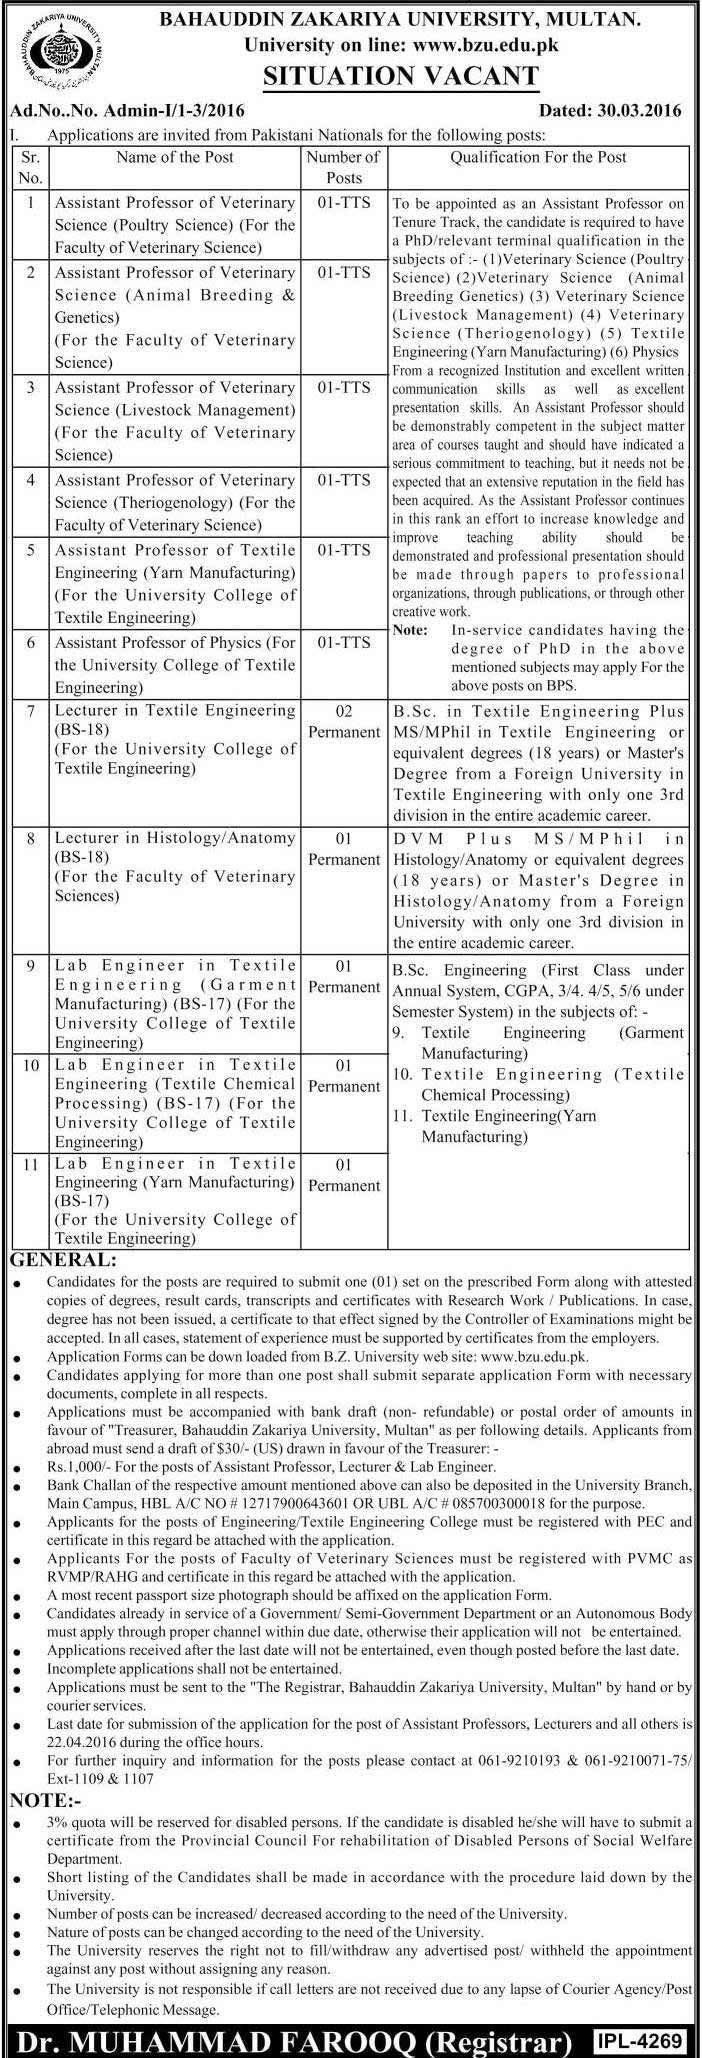 Bahuddin Zakarya University Multan Jobs 2016